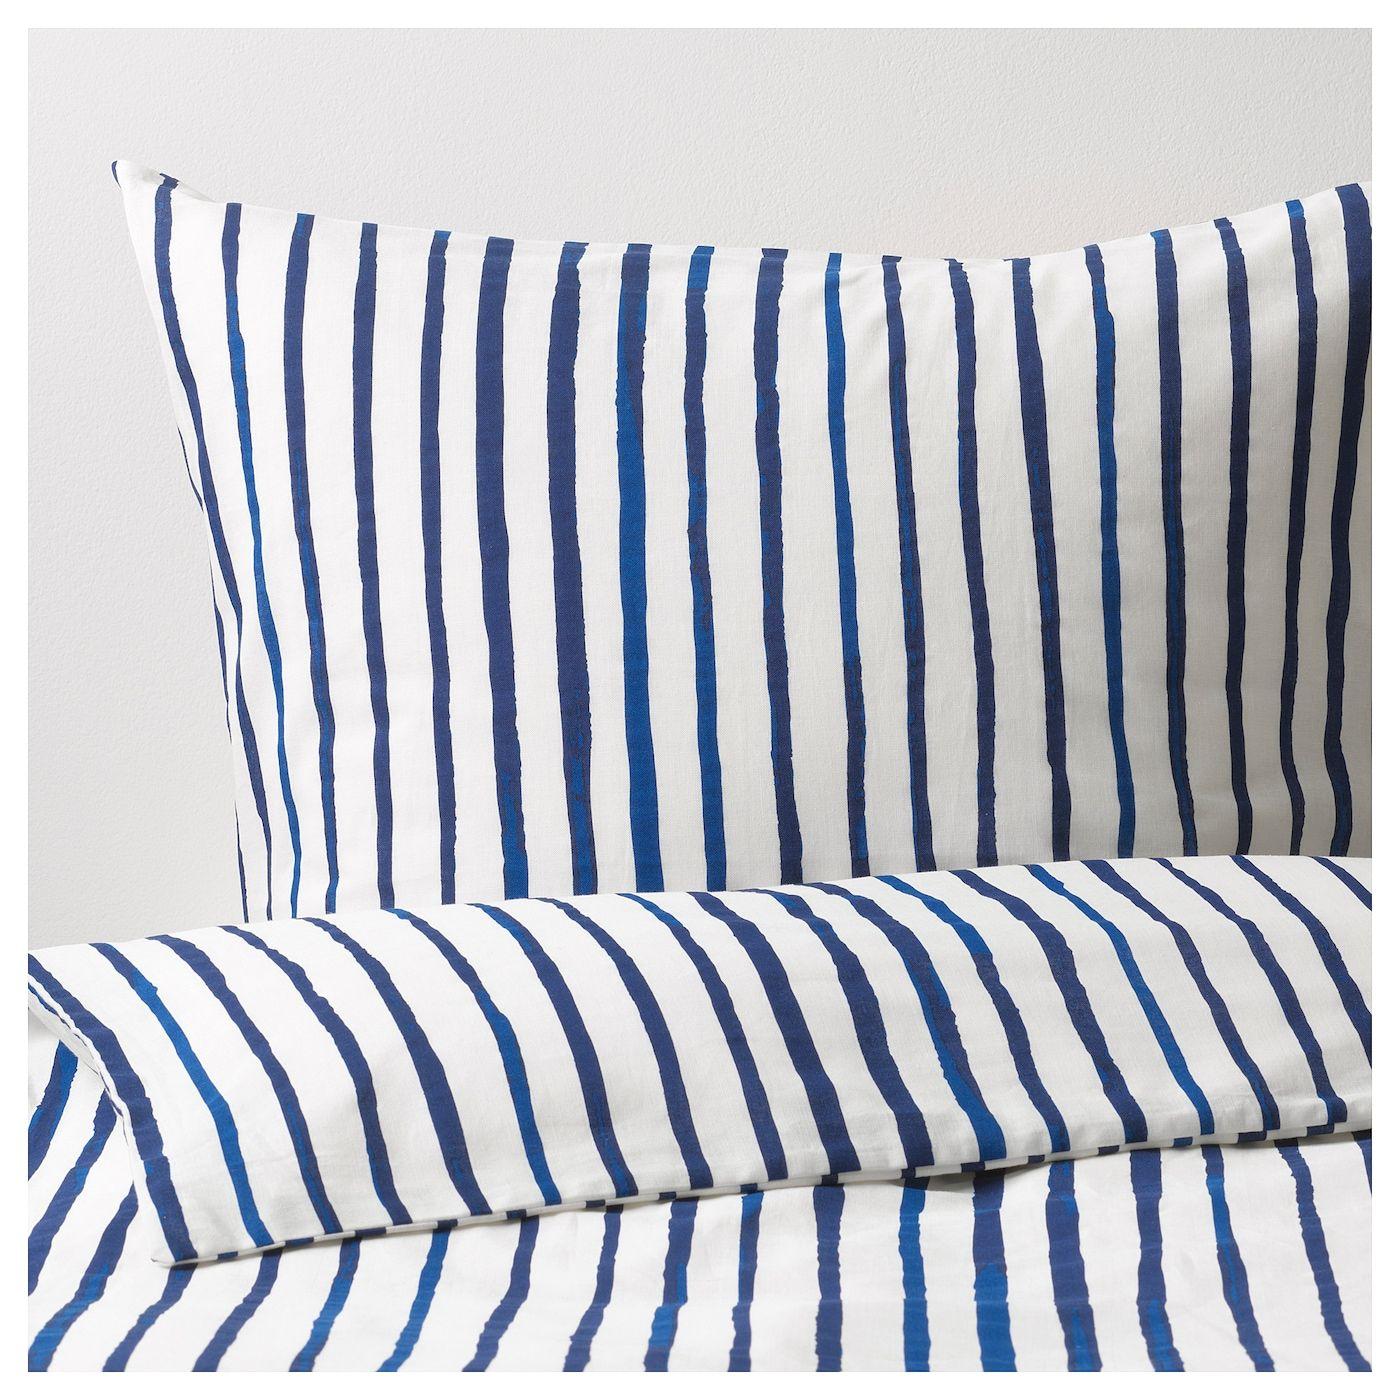 Ikea Federe Cuscini Divano sÅnglÄrka påslakan 1 örngott - randig, blå vit 150x200/50x60